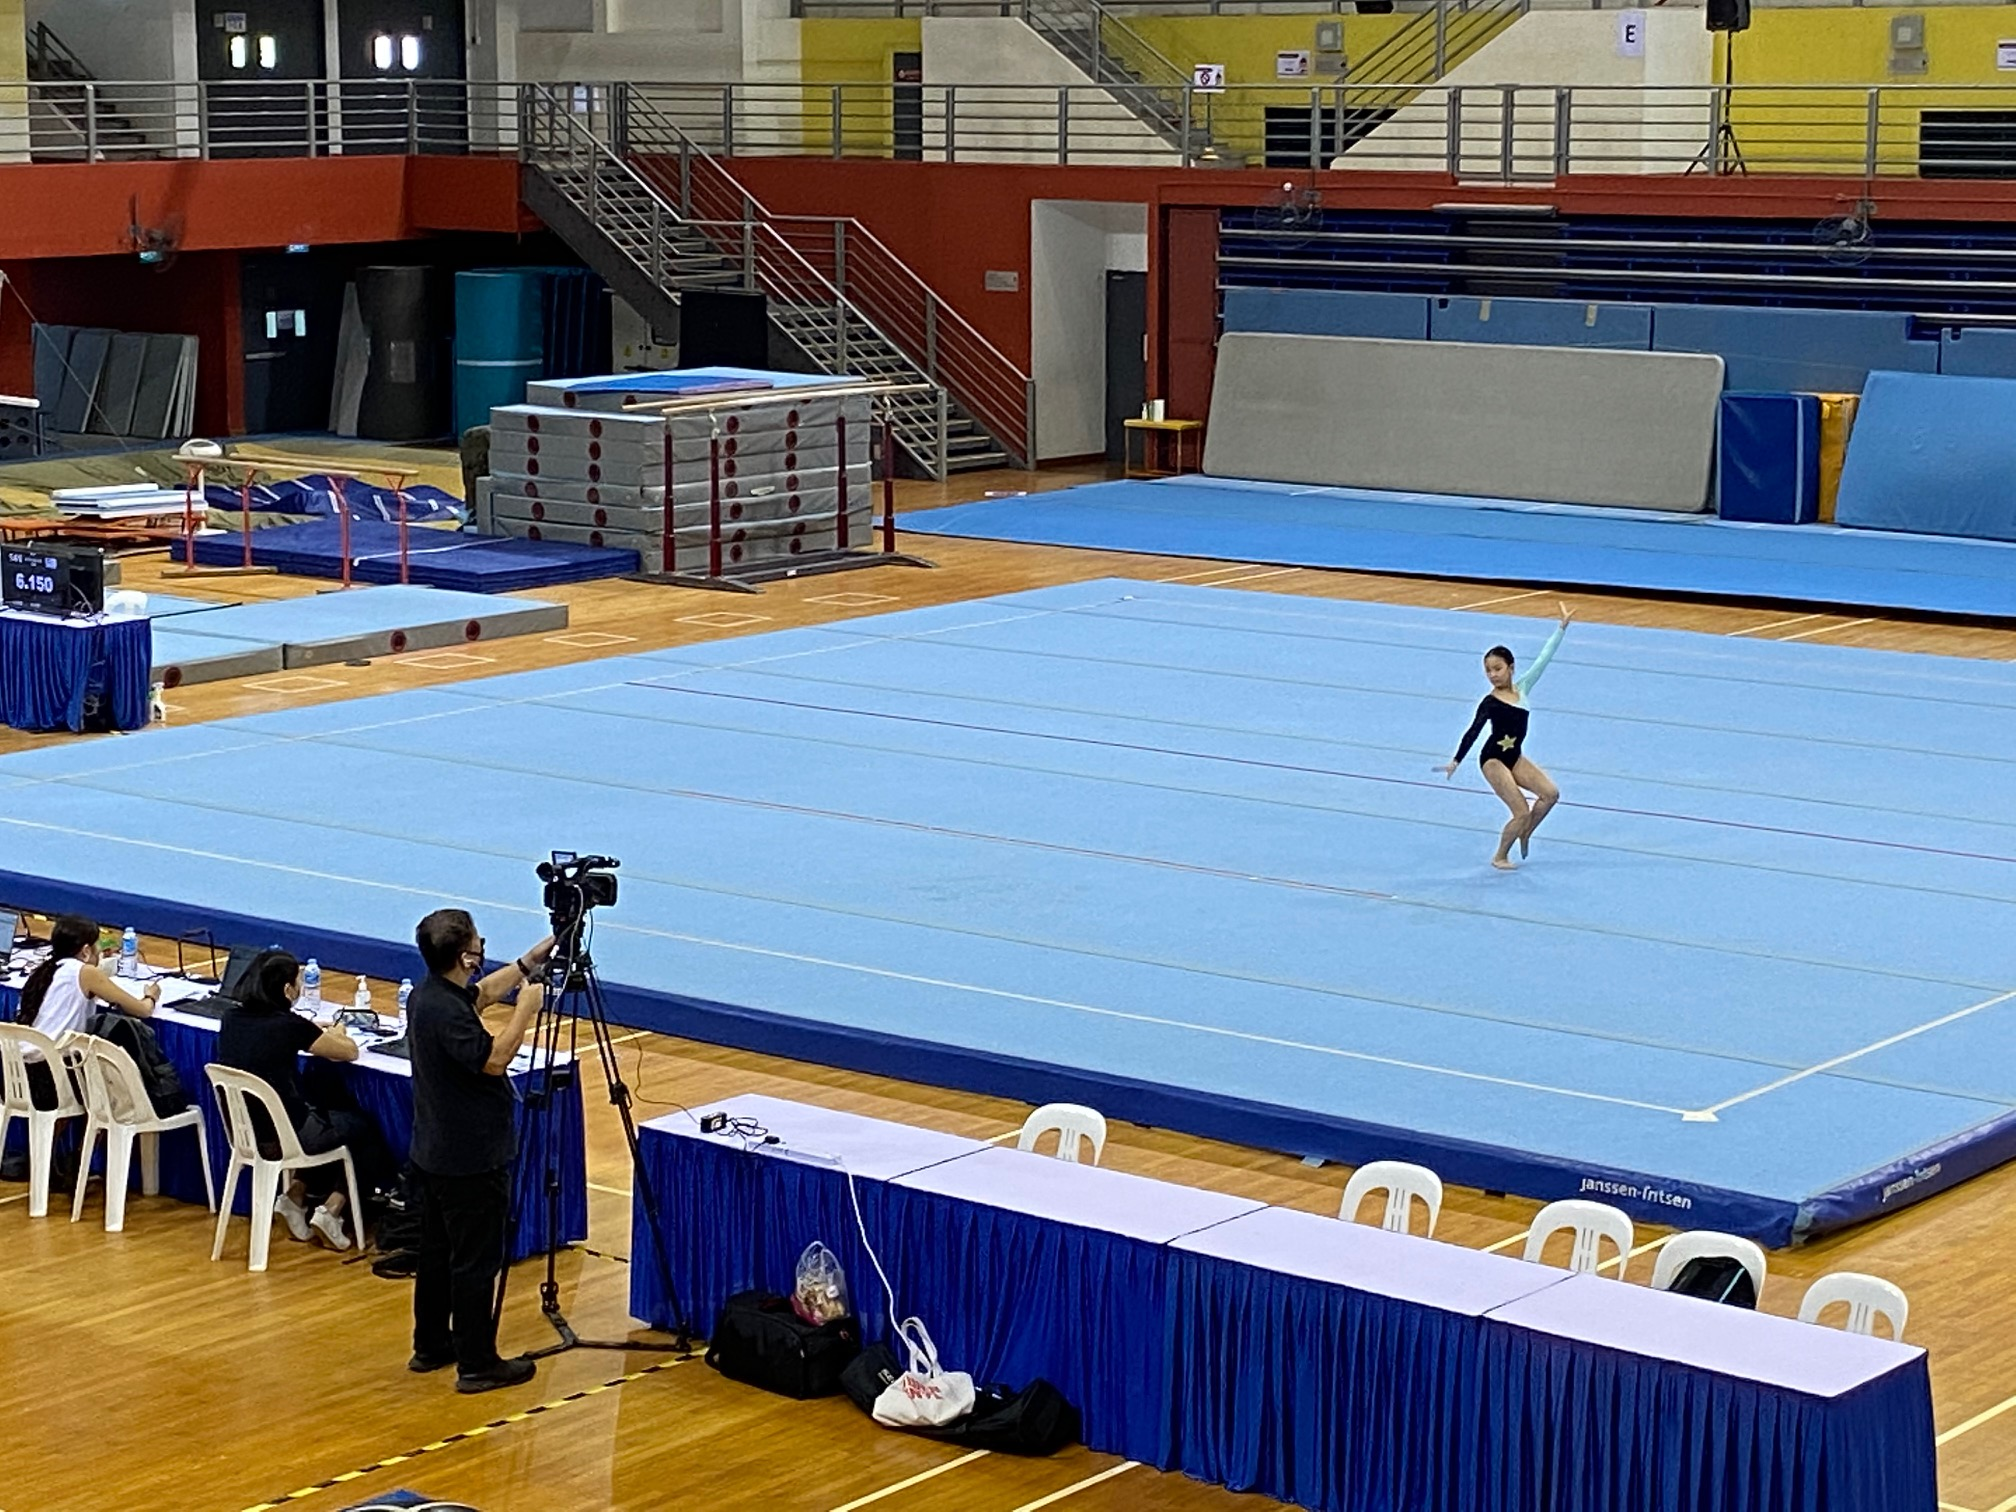 NSG Snr Div gymnastics - floor exercise (Springdale) 2